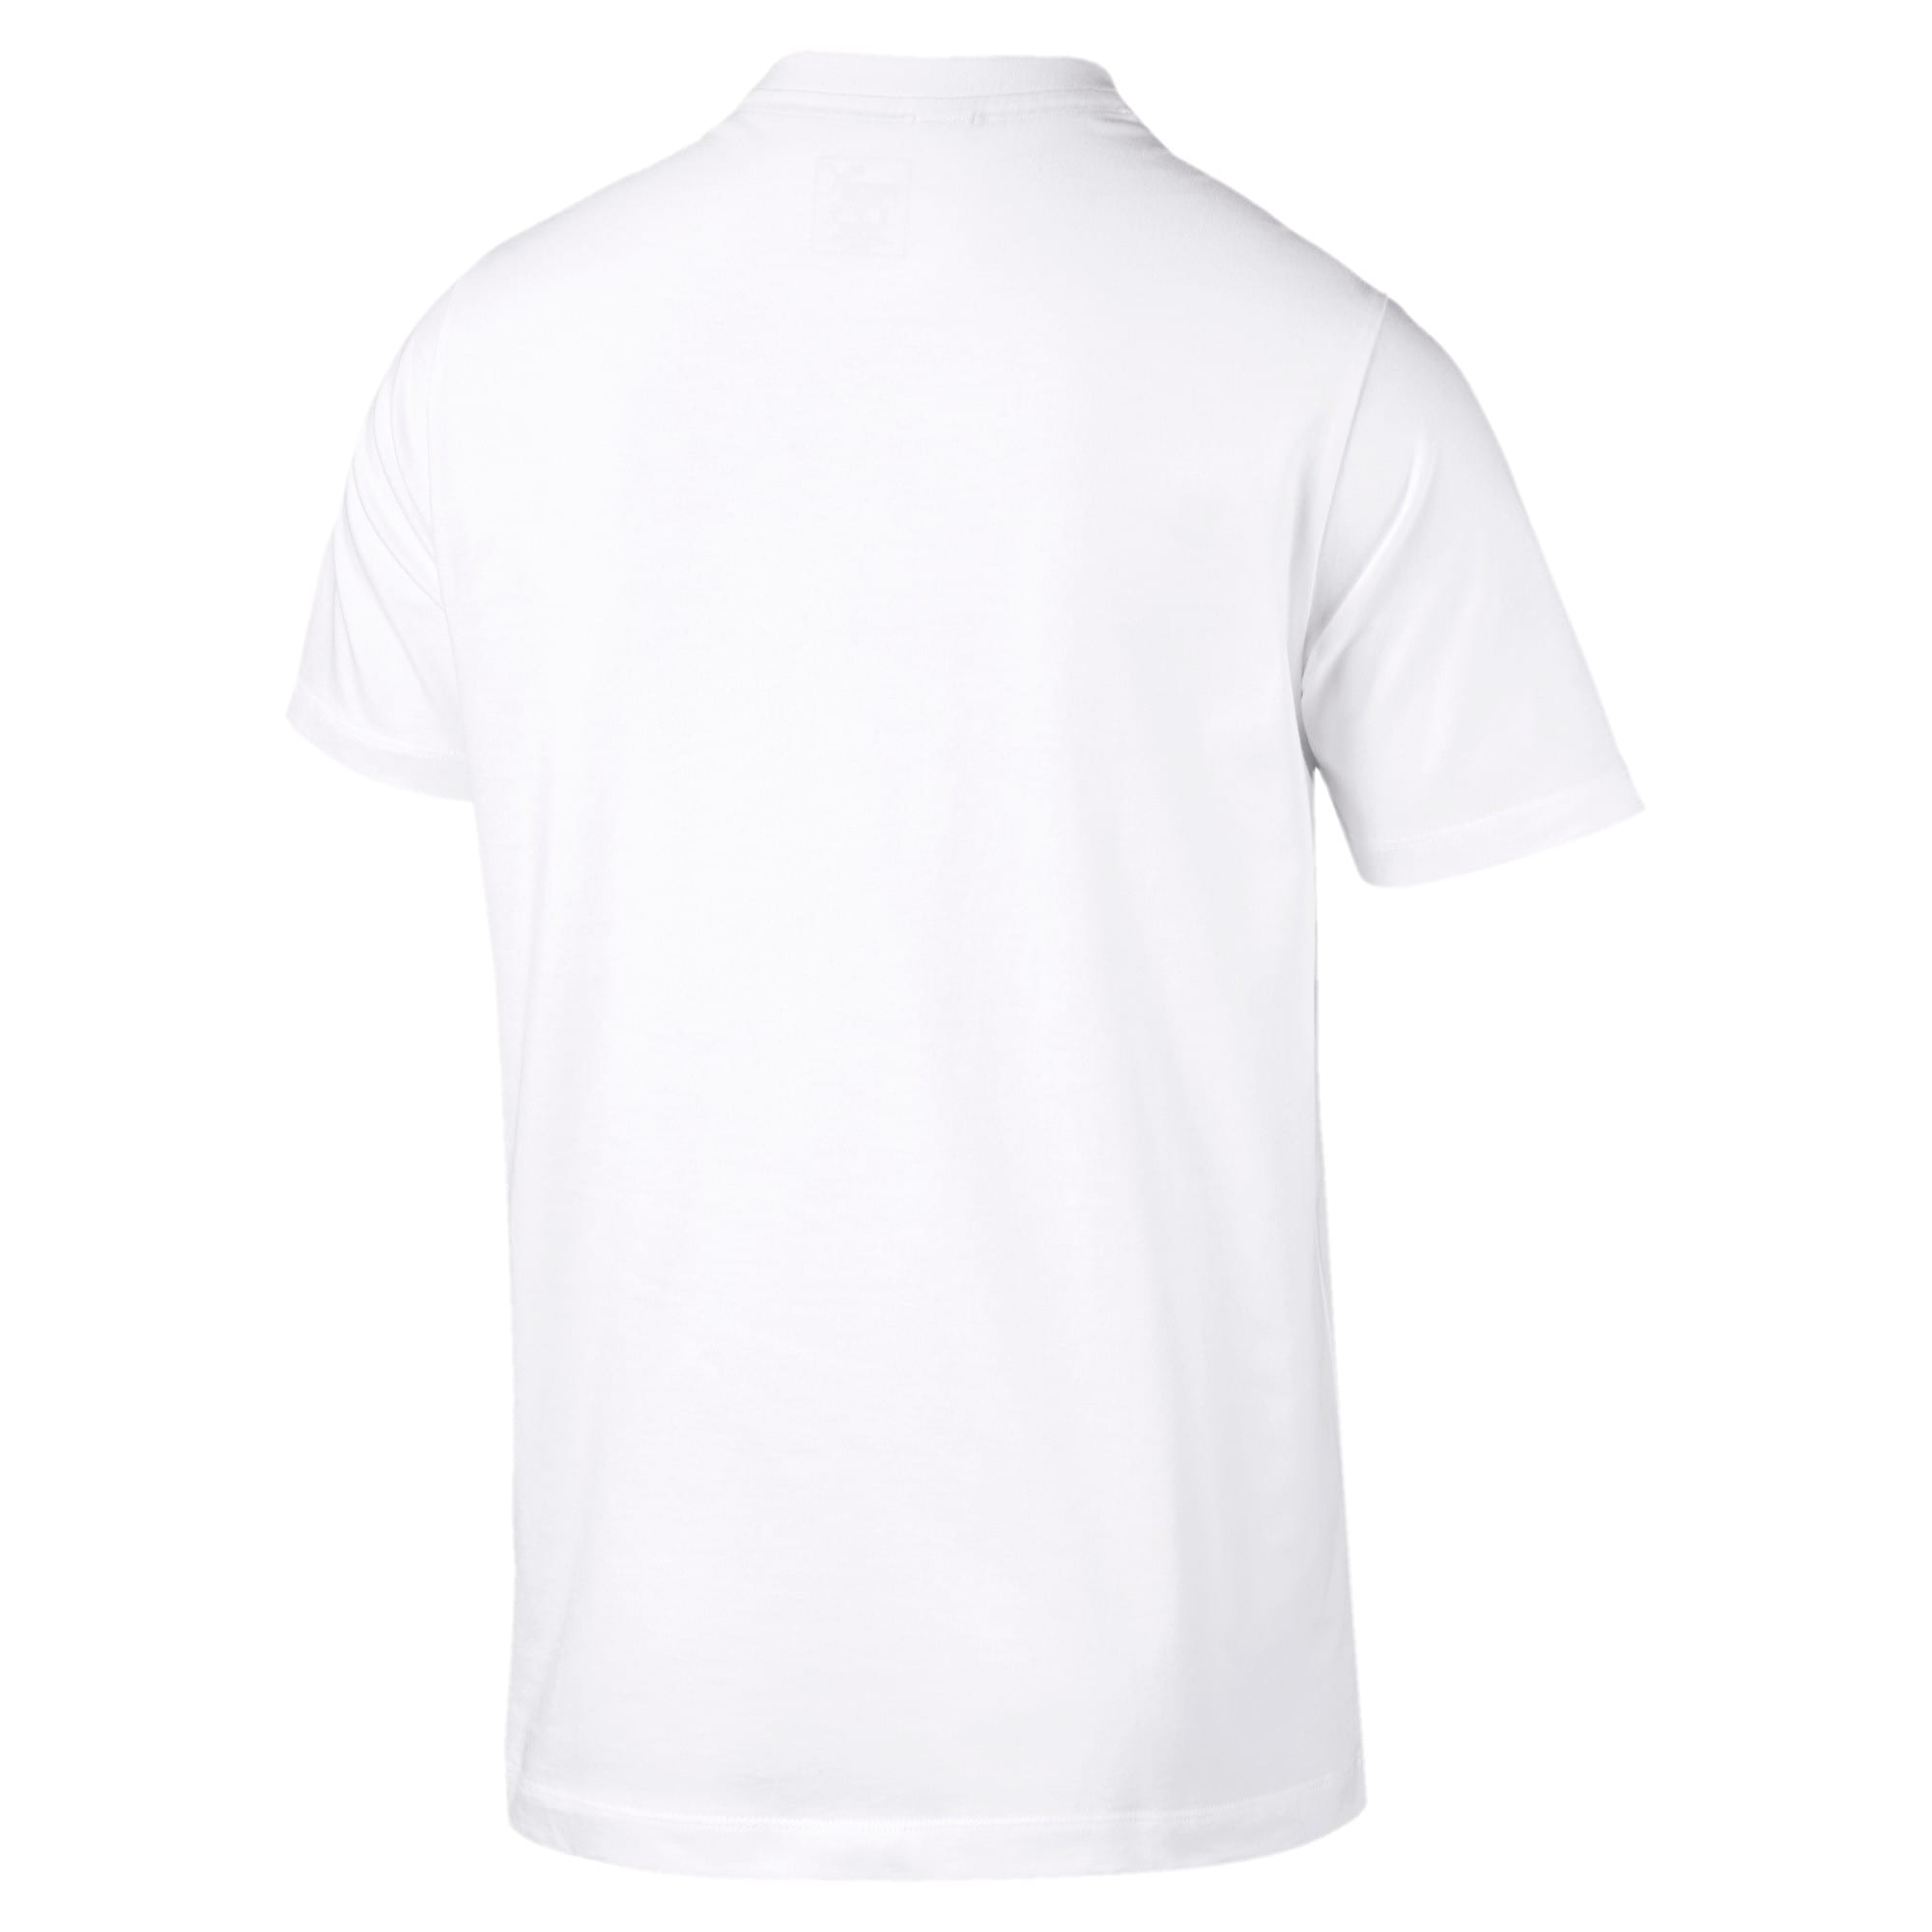 Thumbnail 4 of BMW M Motorsport Men's Graphic T-Shirt, Puma White, medium-IND